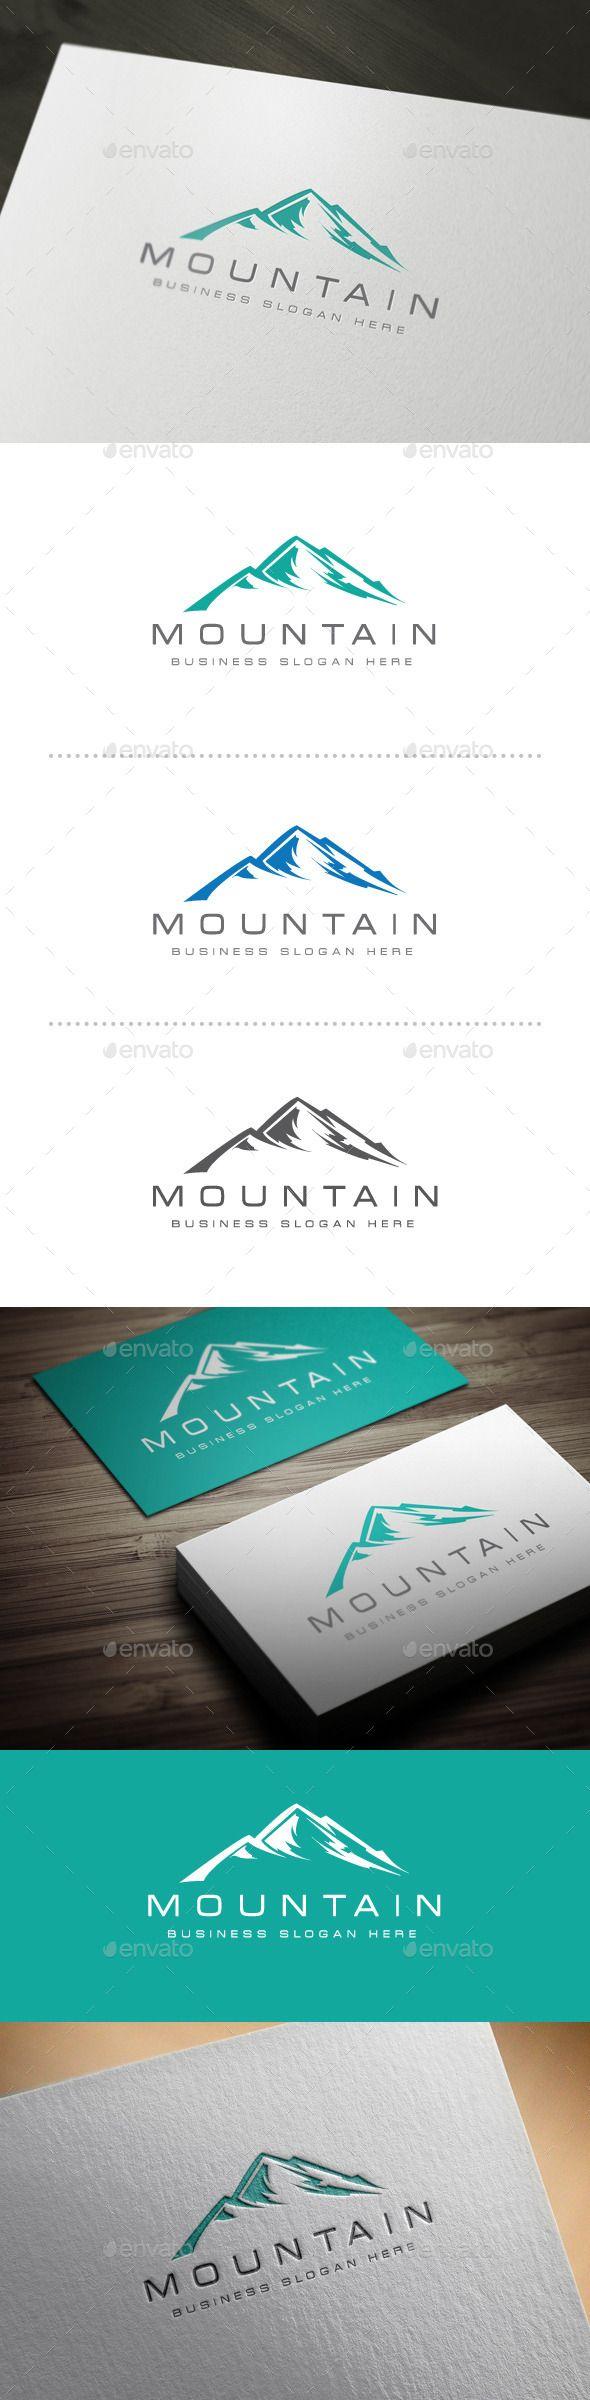 Mountain Logo — Vector EPS #mountain logo template #corporate • Available here → https://graphicriver.net/item/mountain-logo/10521578?ref=pxcr